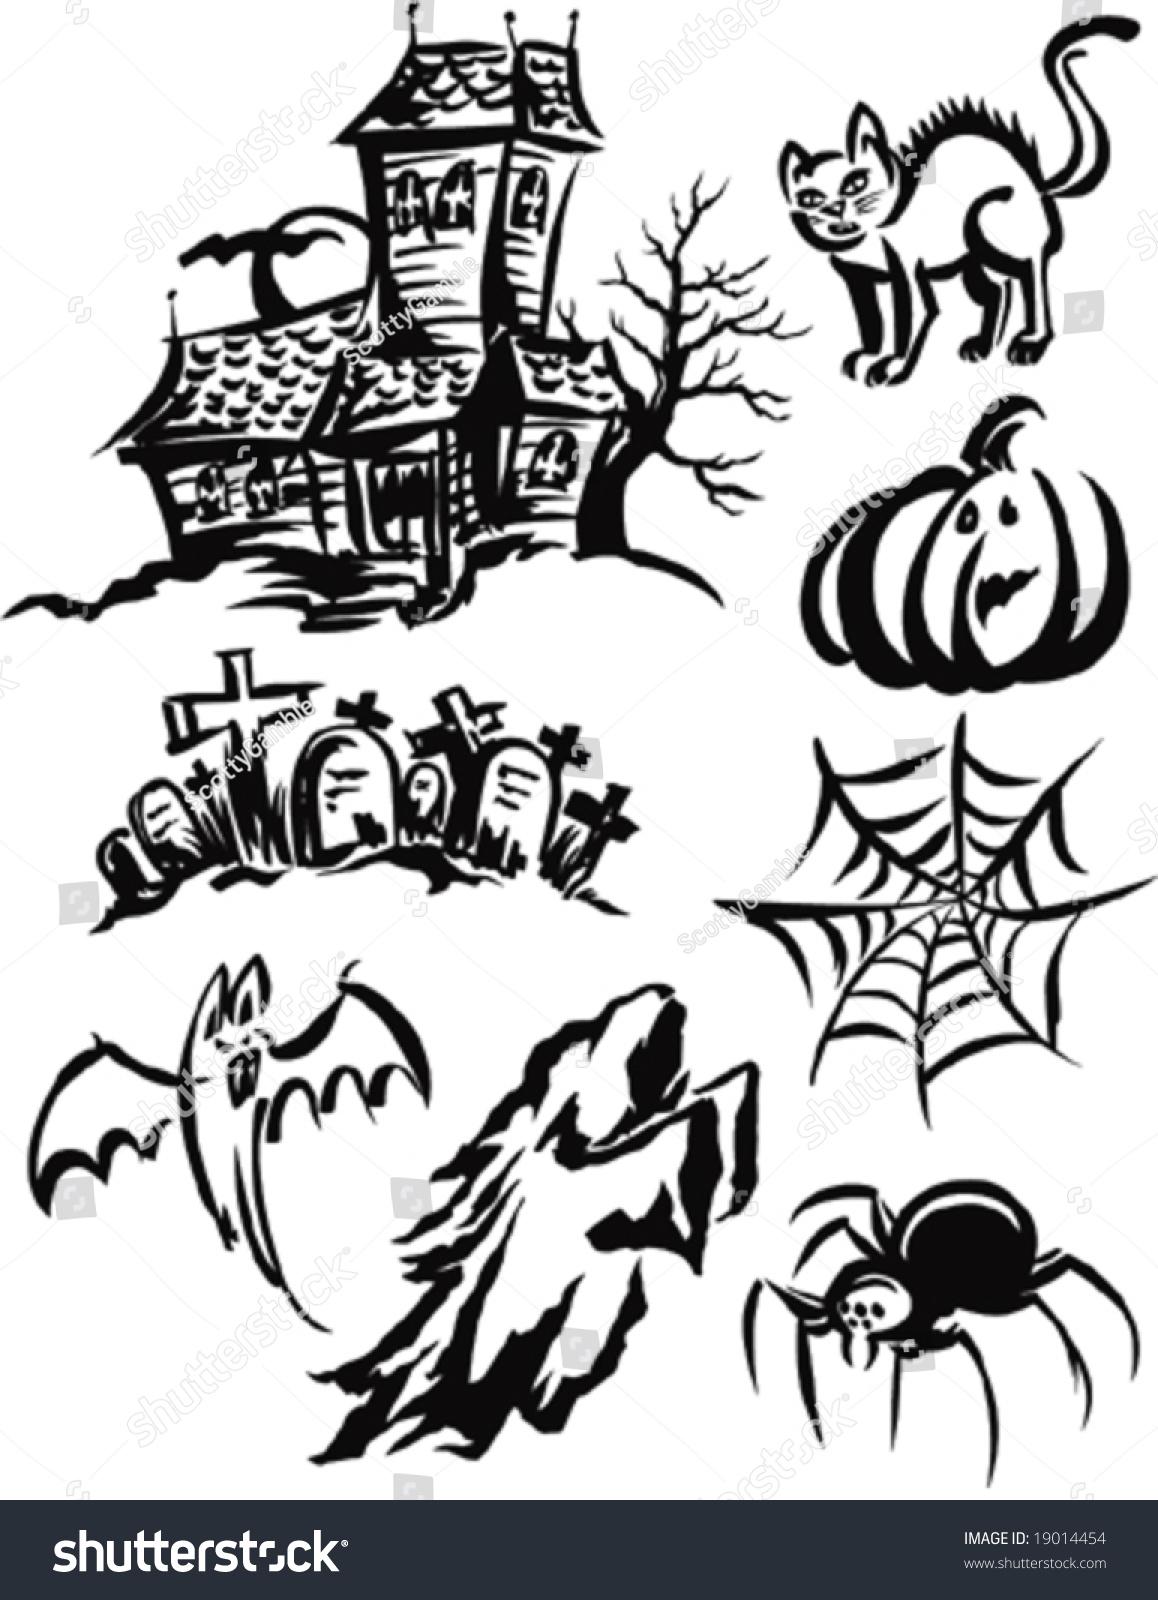 Halloween Vectors halloween halloween vector background banners pumpkin head zombie hand halloween symbols Halloween Vectors 19014454 Shutterstock